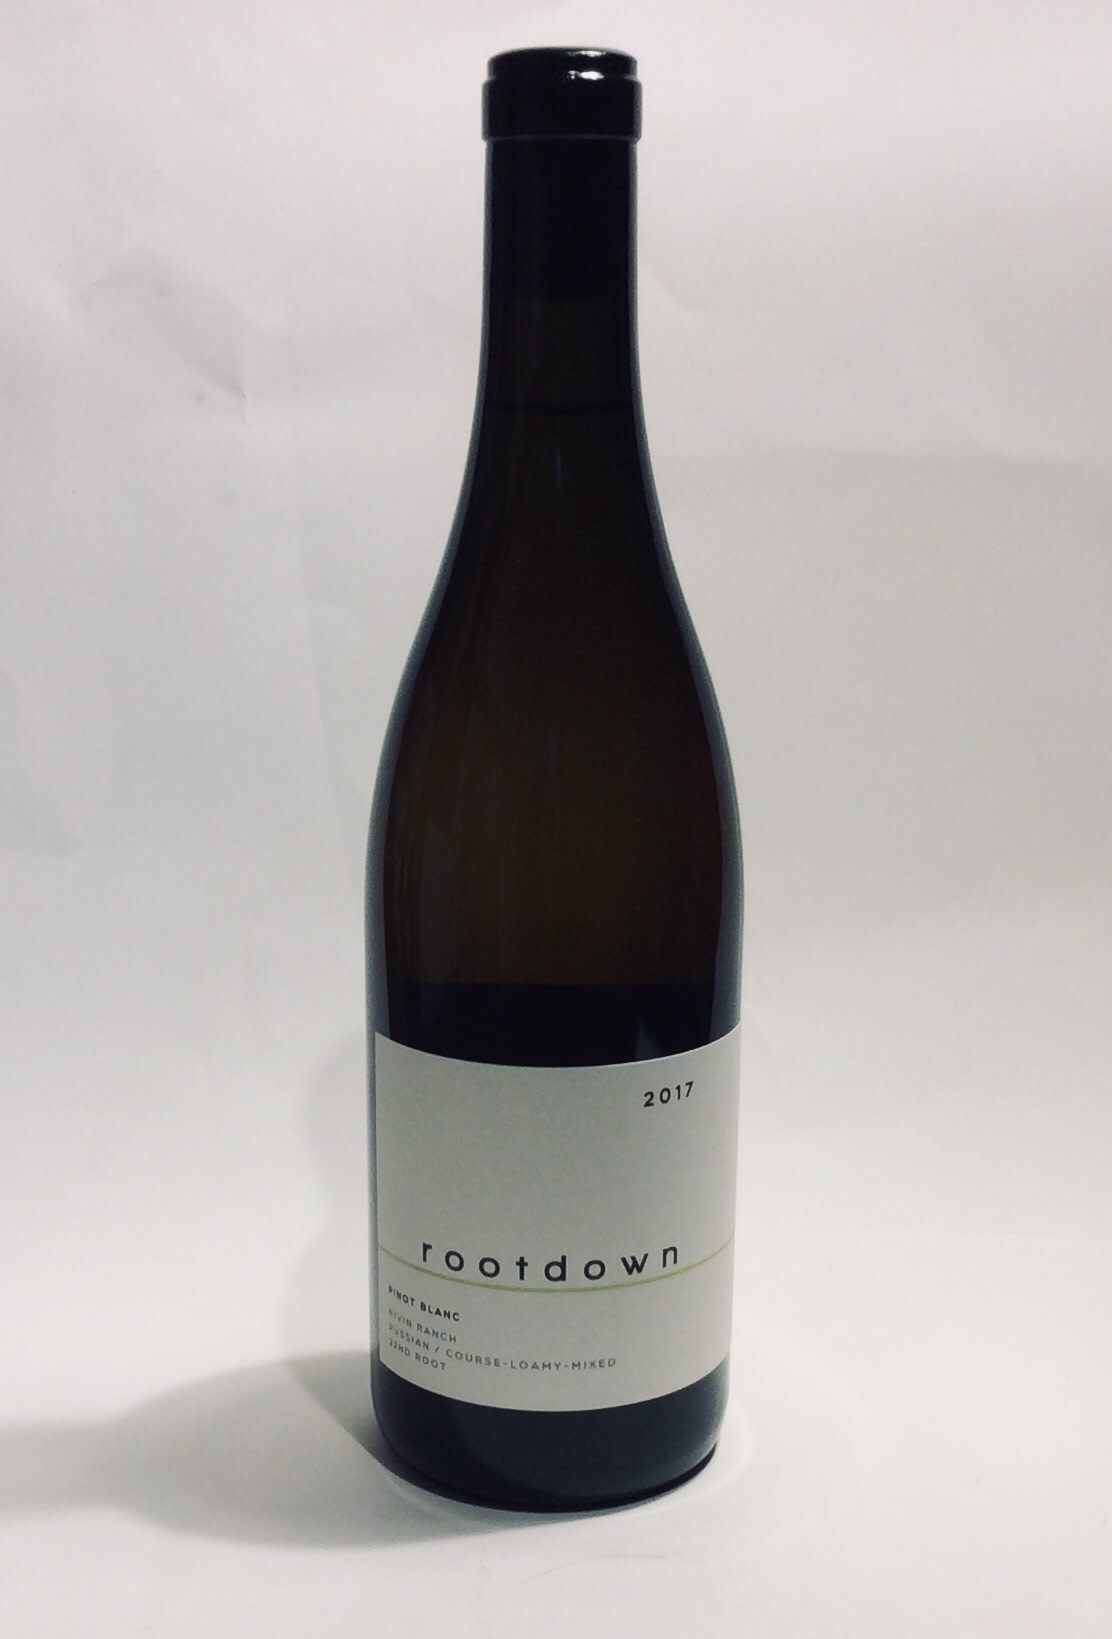 Rootdown - Pinot Blanc Rivin Ranch - Mendocino County 2017 (750 ml)